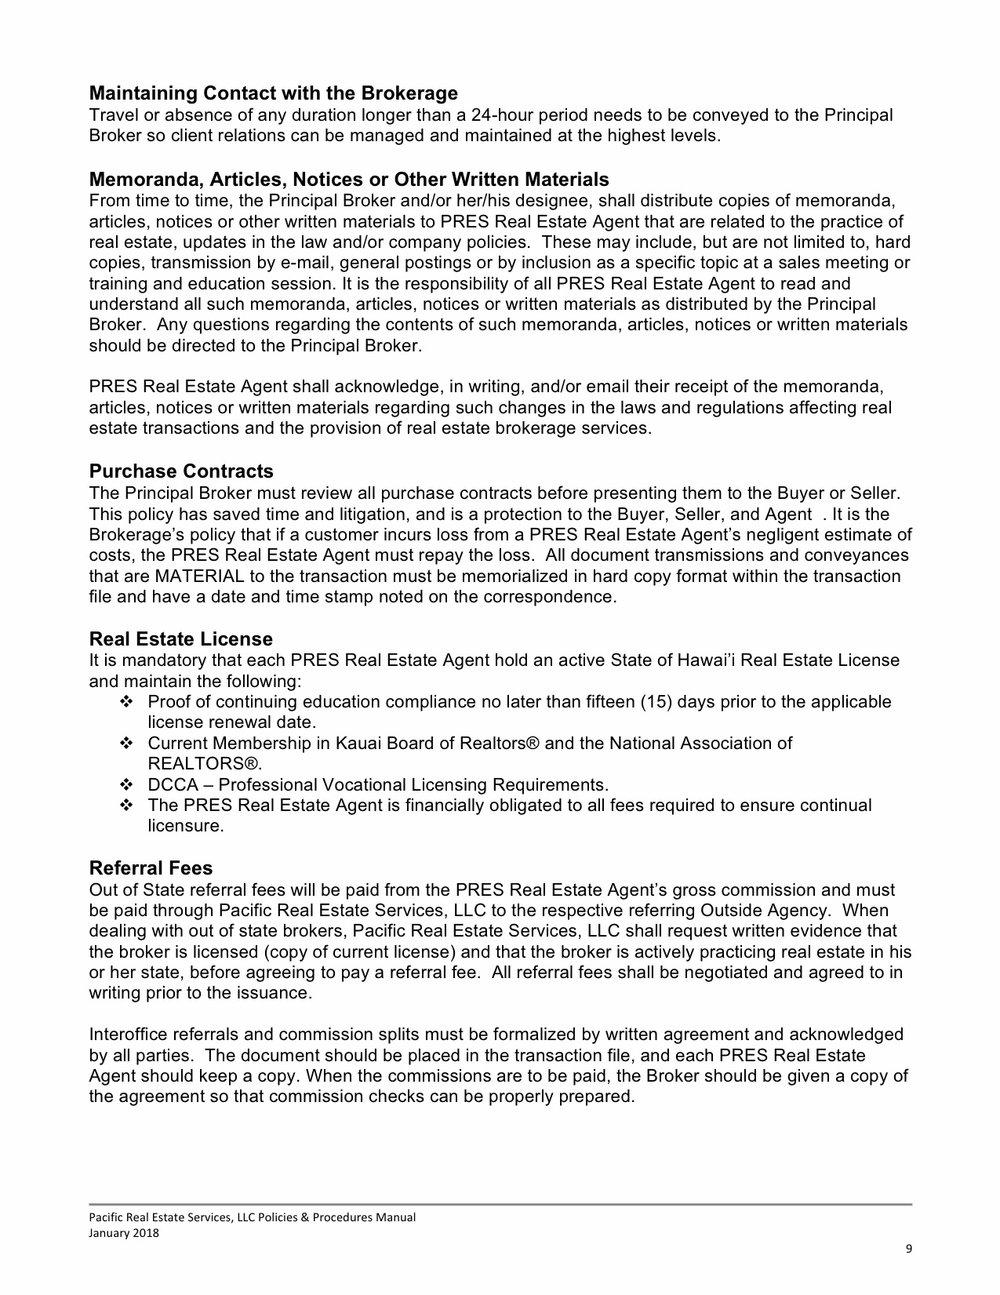 PRES Pol-Proc Manual 2018_M.jpg